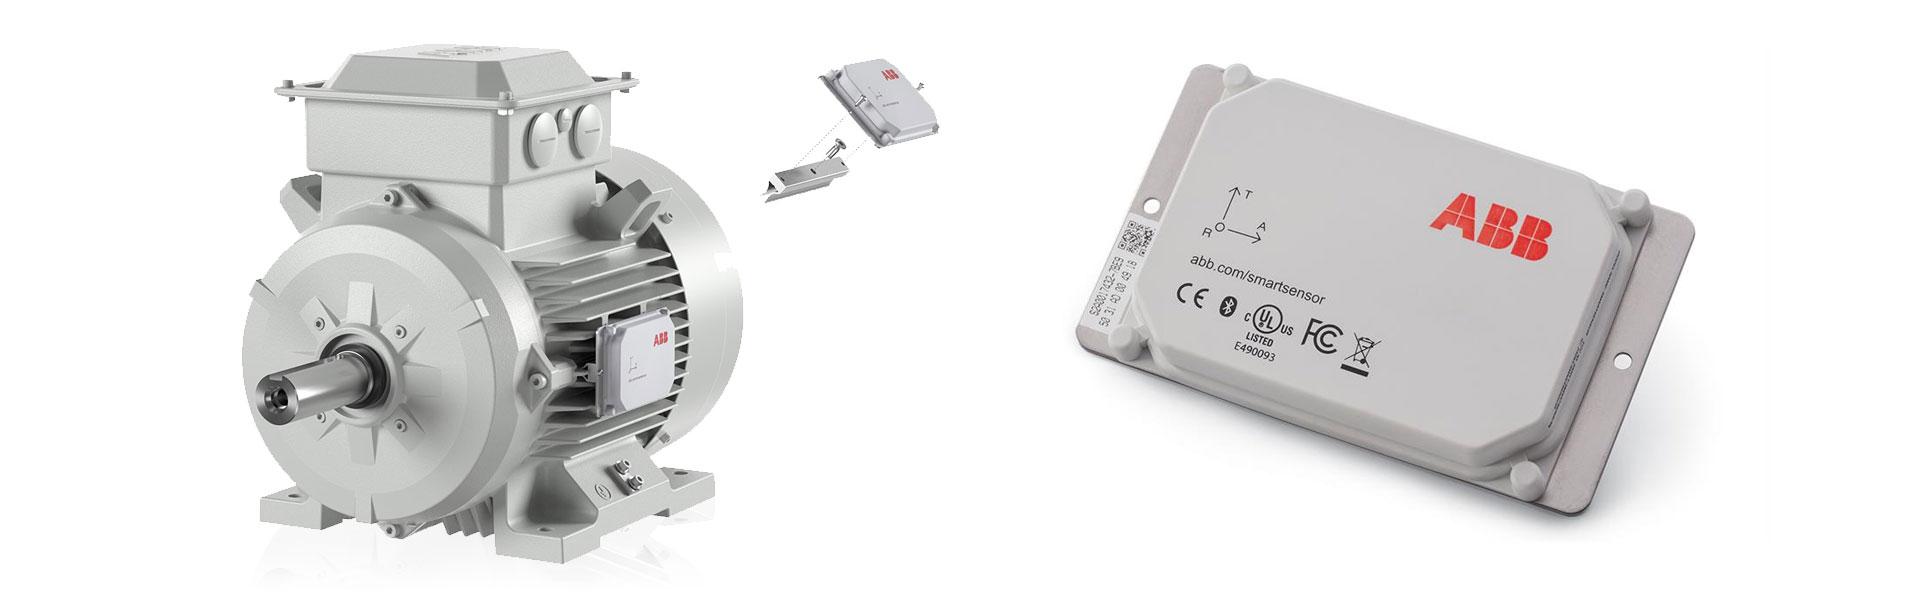 ABB Smart sensor